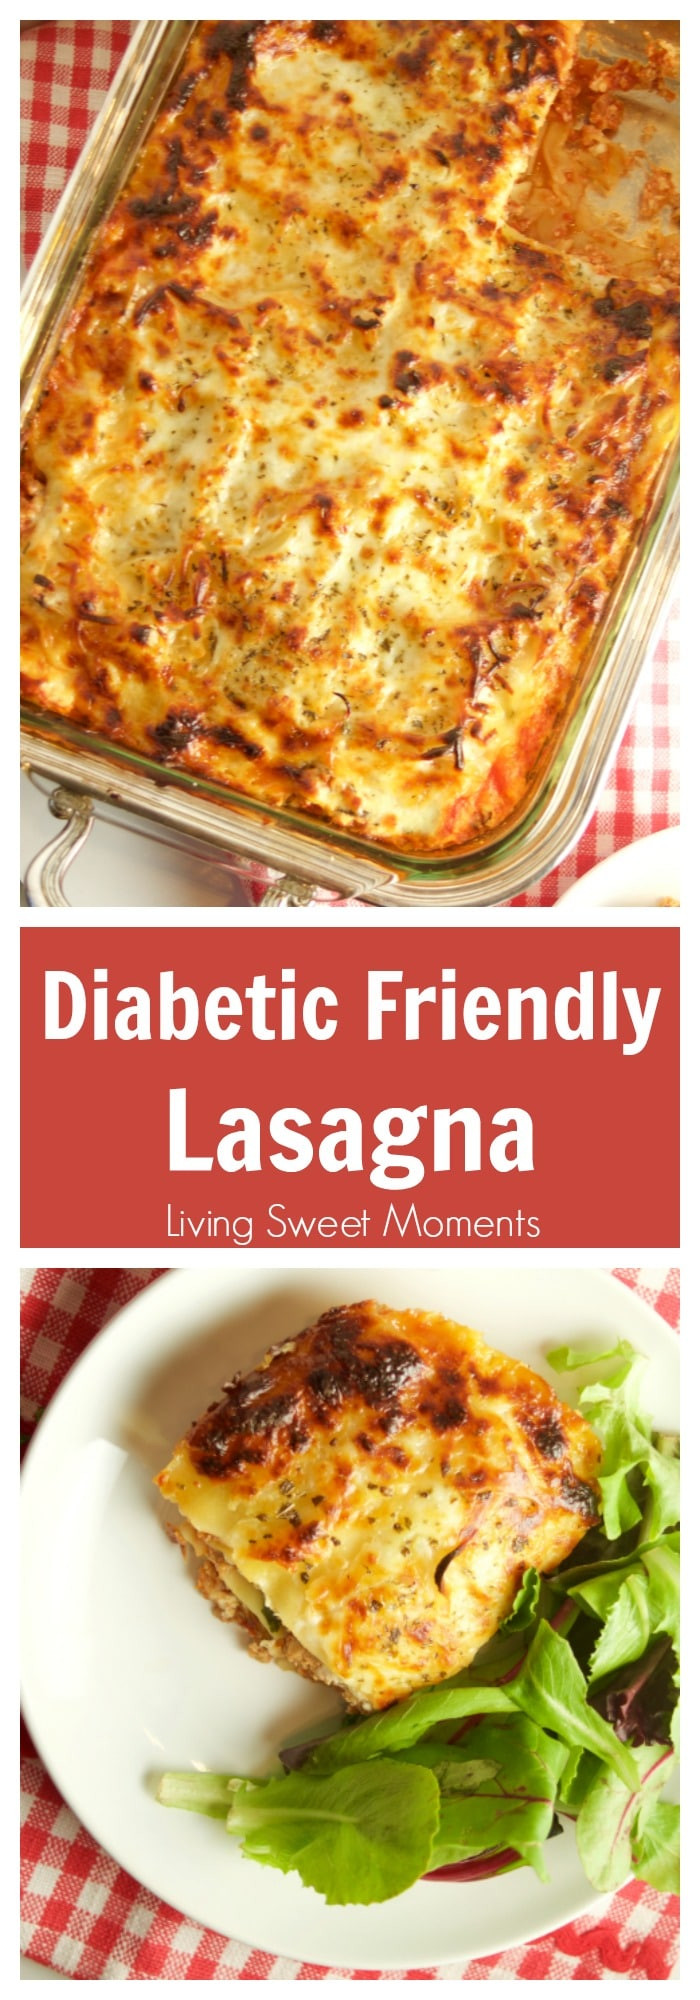 Easy Diabetic Recipes  Diabetic Lasagna Recipe Living Sweet Moments